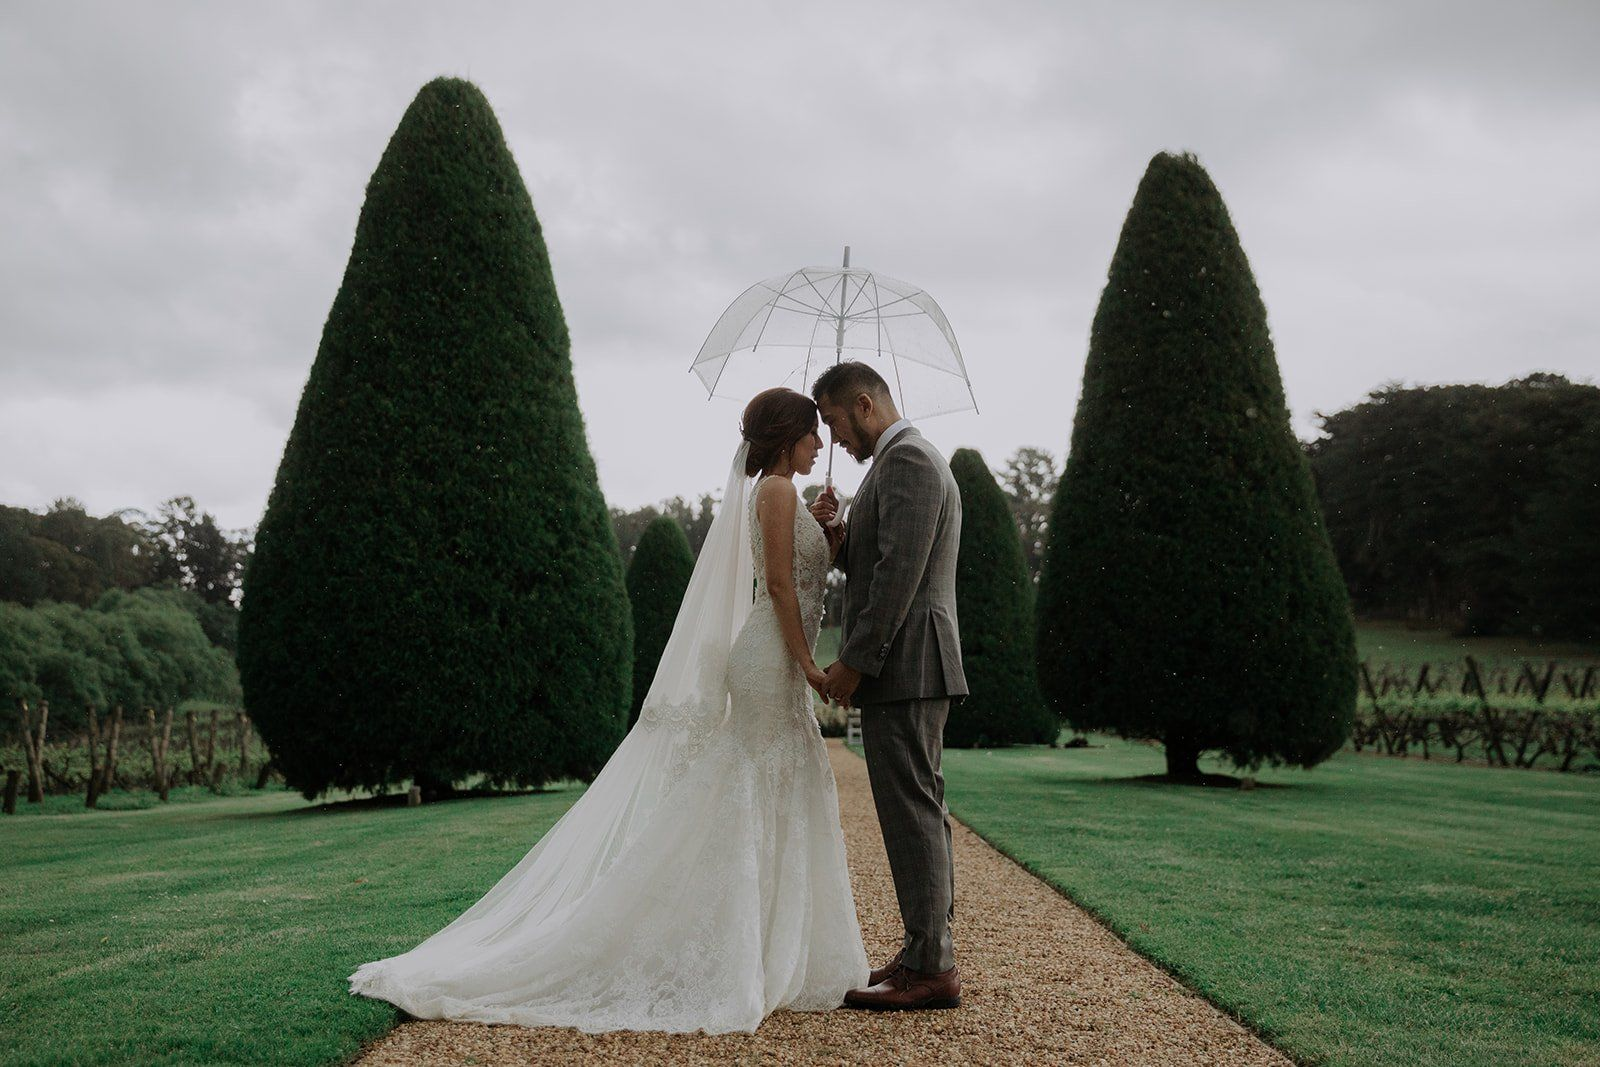 destination wedding venue ideas